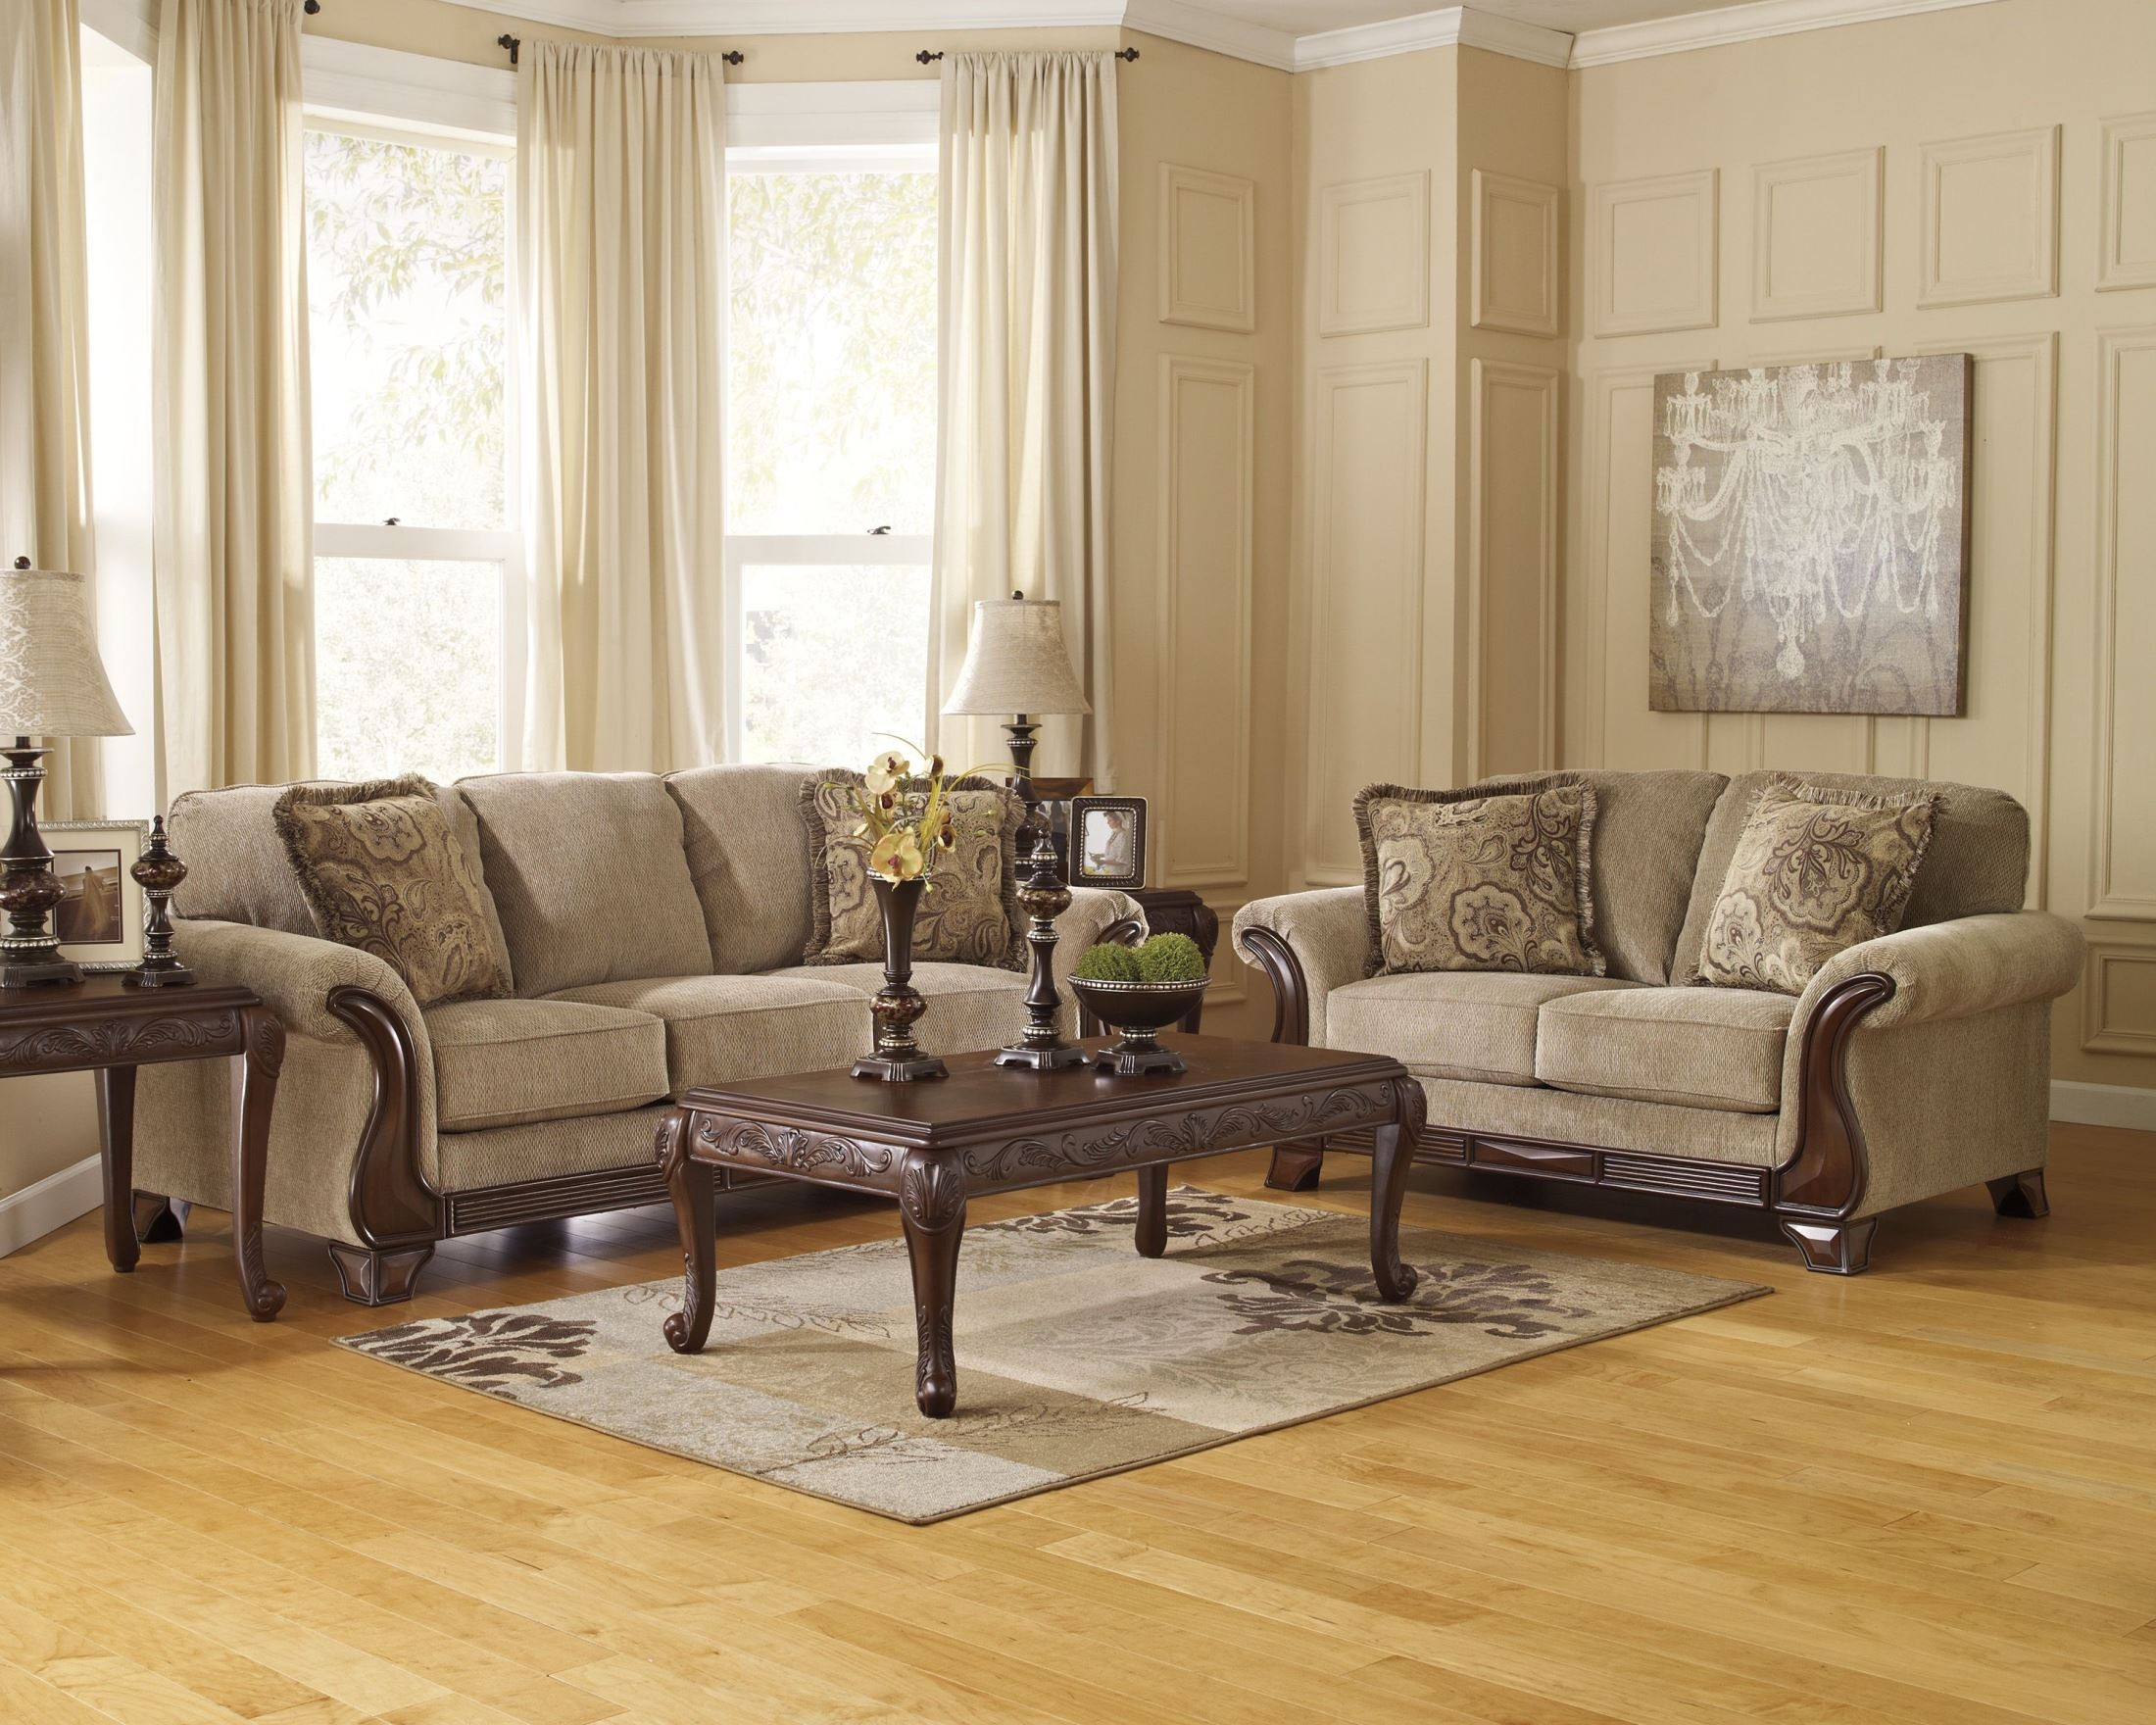 Lanett Living Room Set From Ashley 4490038 Coleman Furniture